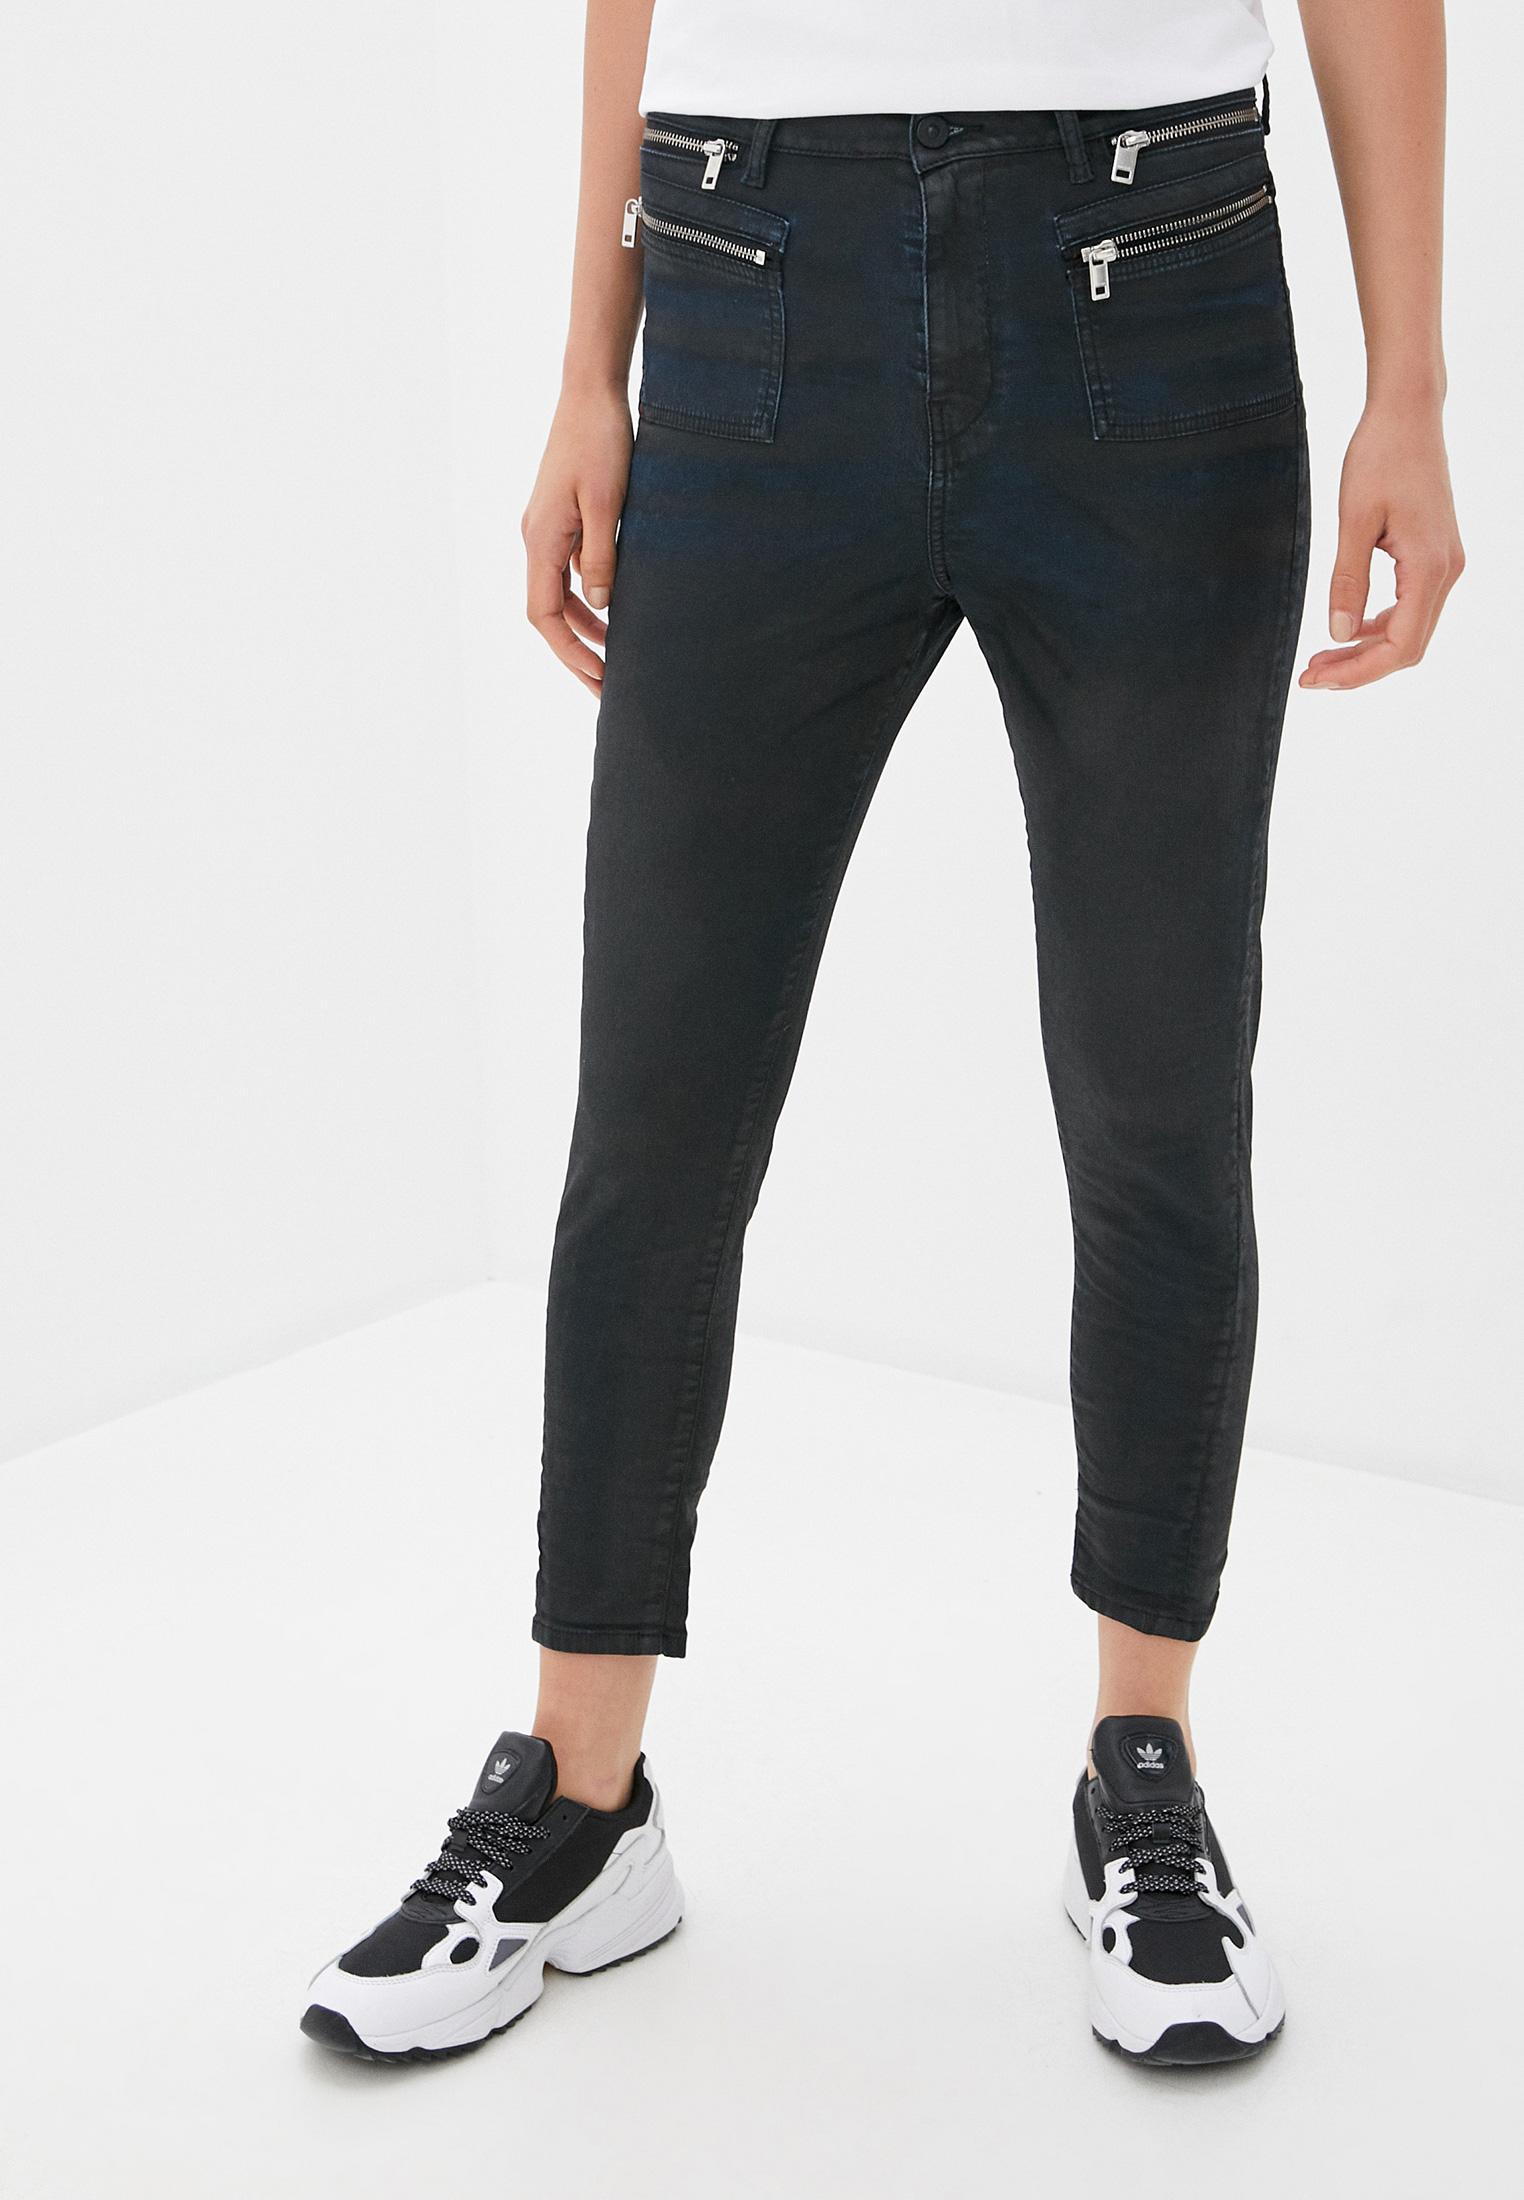 Зауженные джинсы Diesel (Дизель) 00SPNF0688U